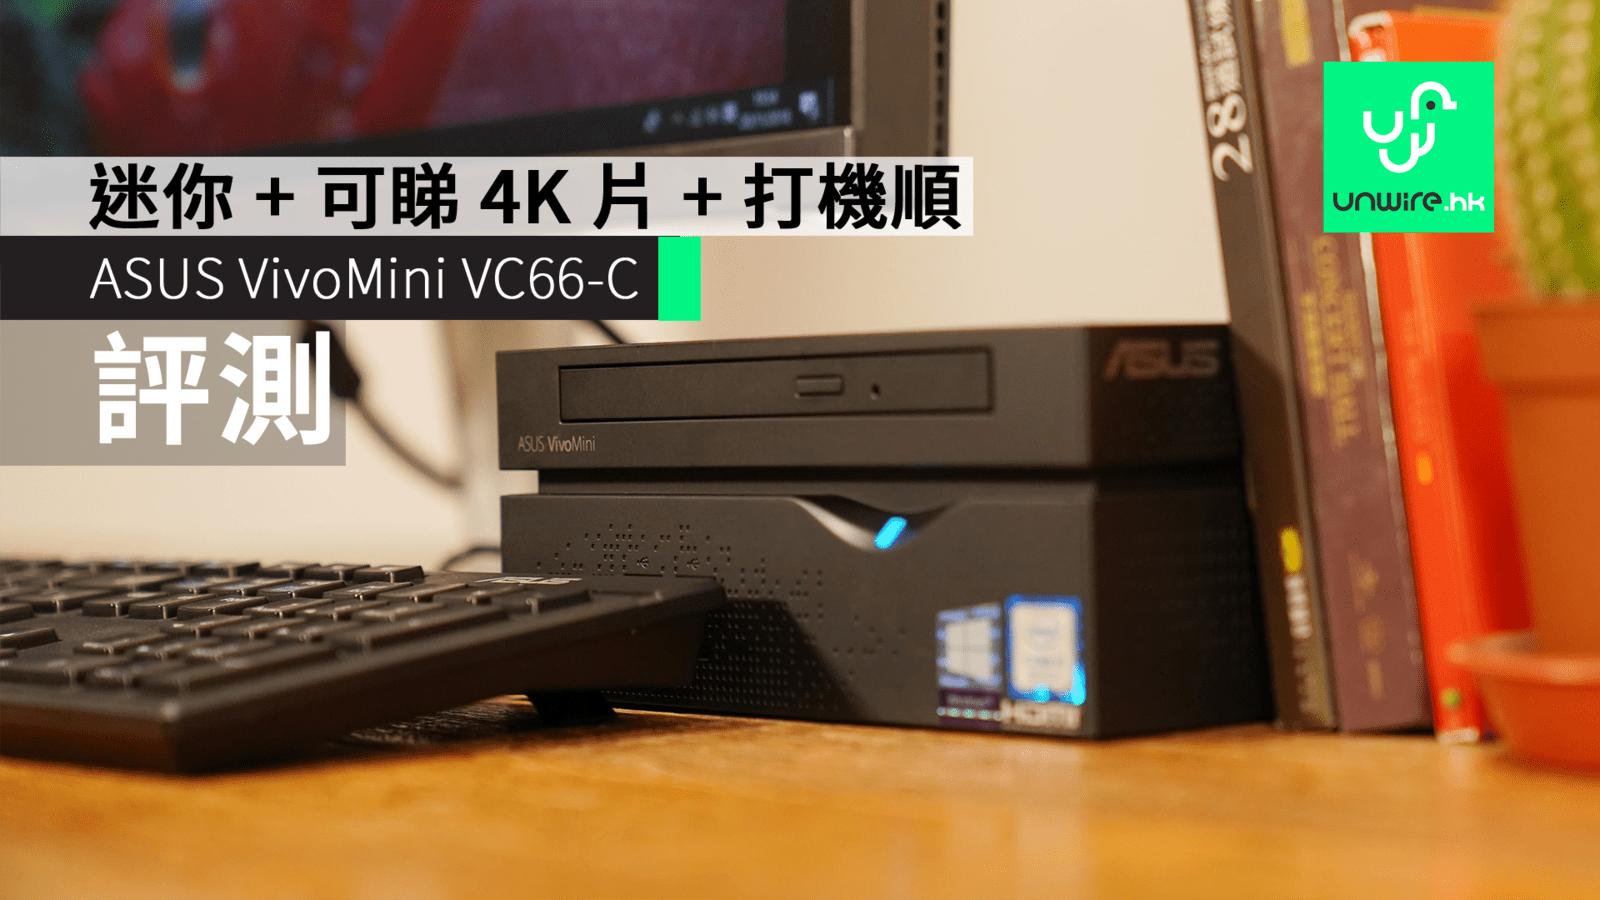 ASUS VivoMini VC66-C 迷你慳位 + 可睇 4K 片 + 打機順